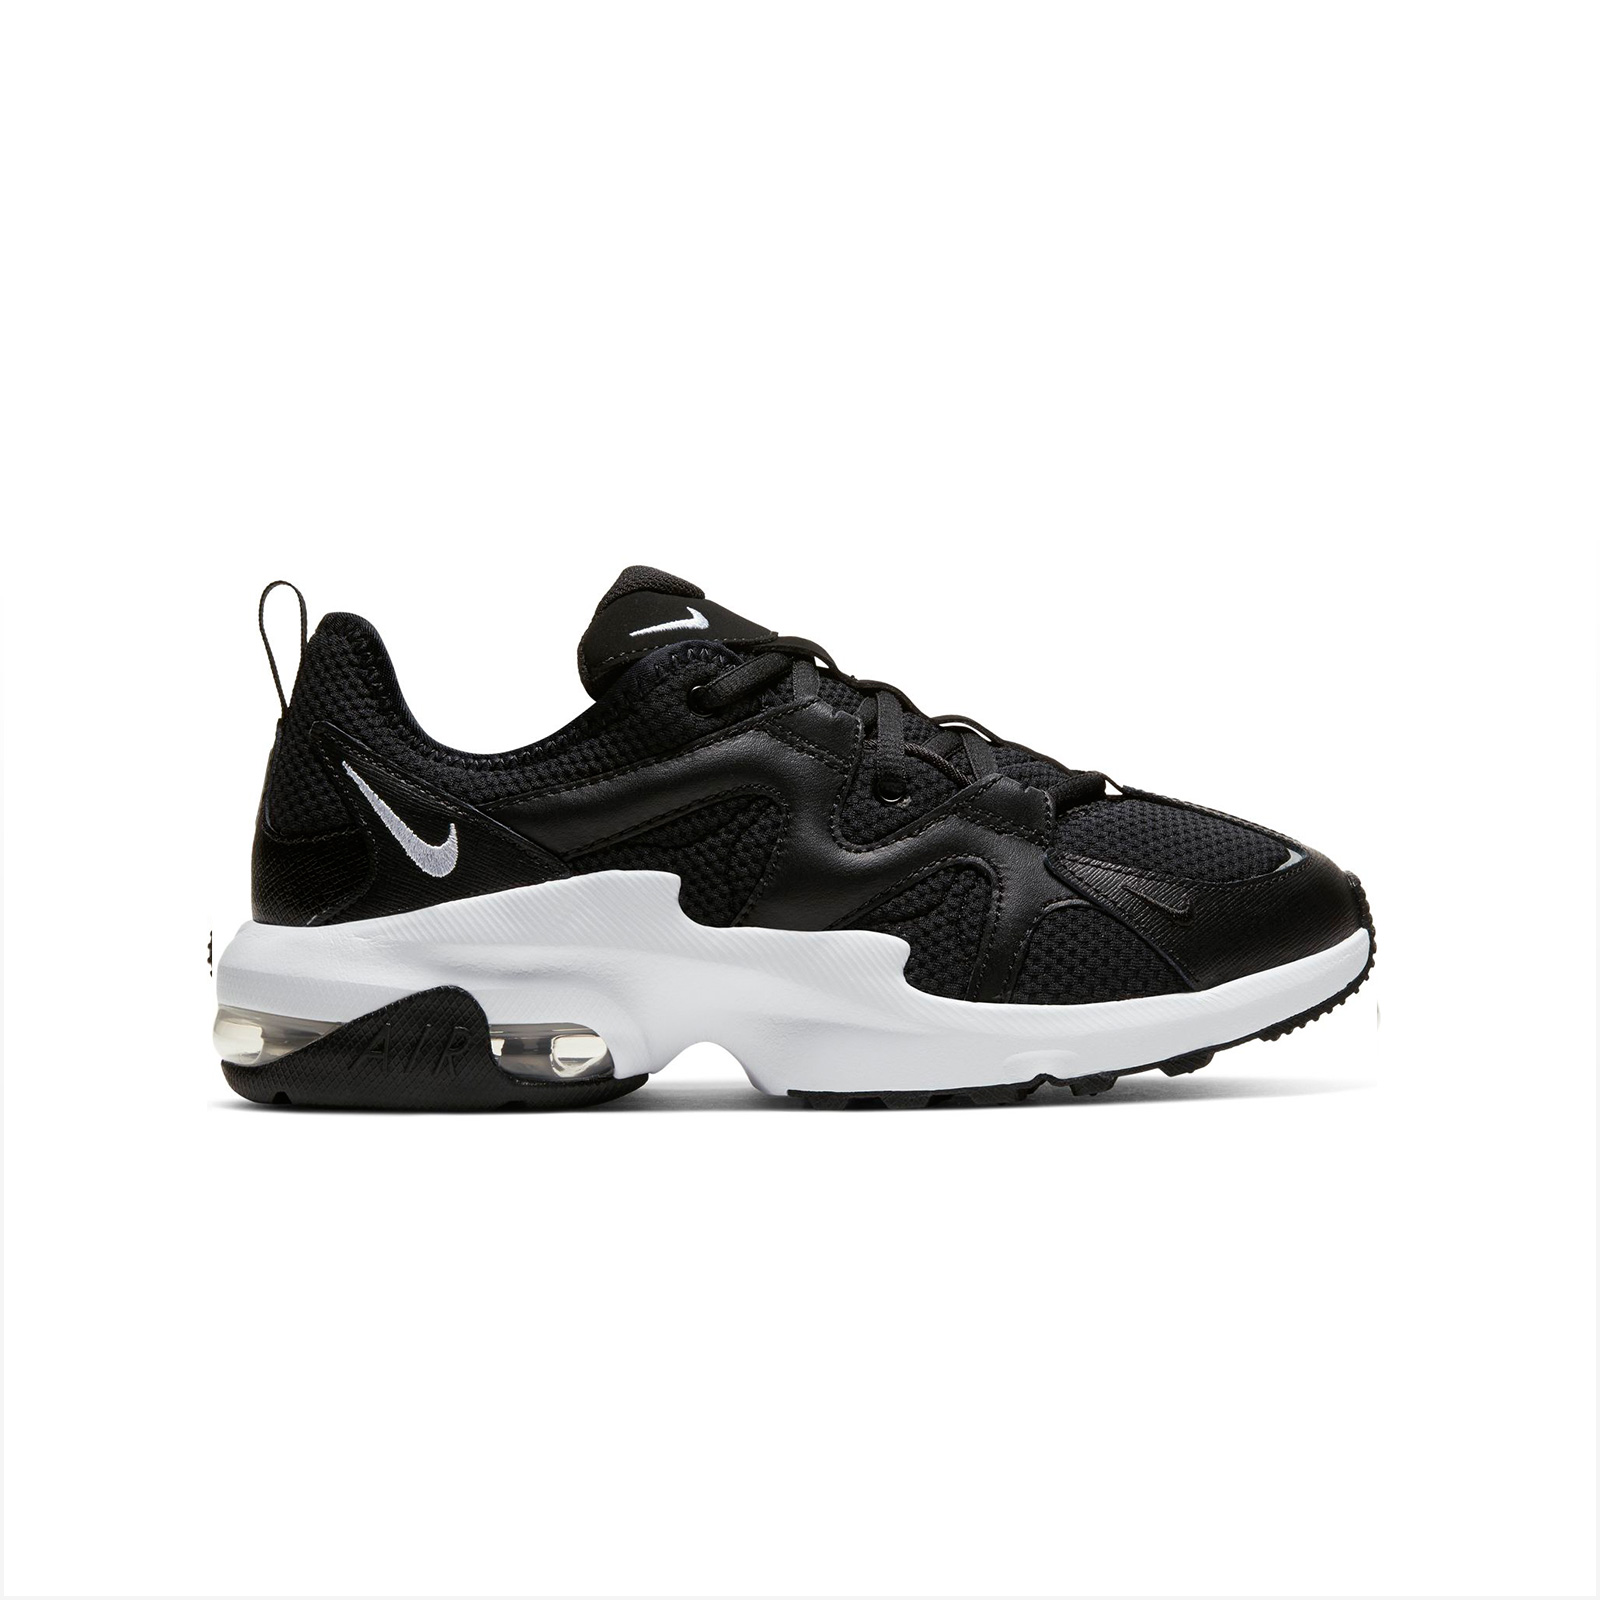 Nike - WMNS NIKE AIR MAX GRAVITON - BLACK/WHITE